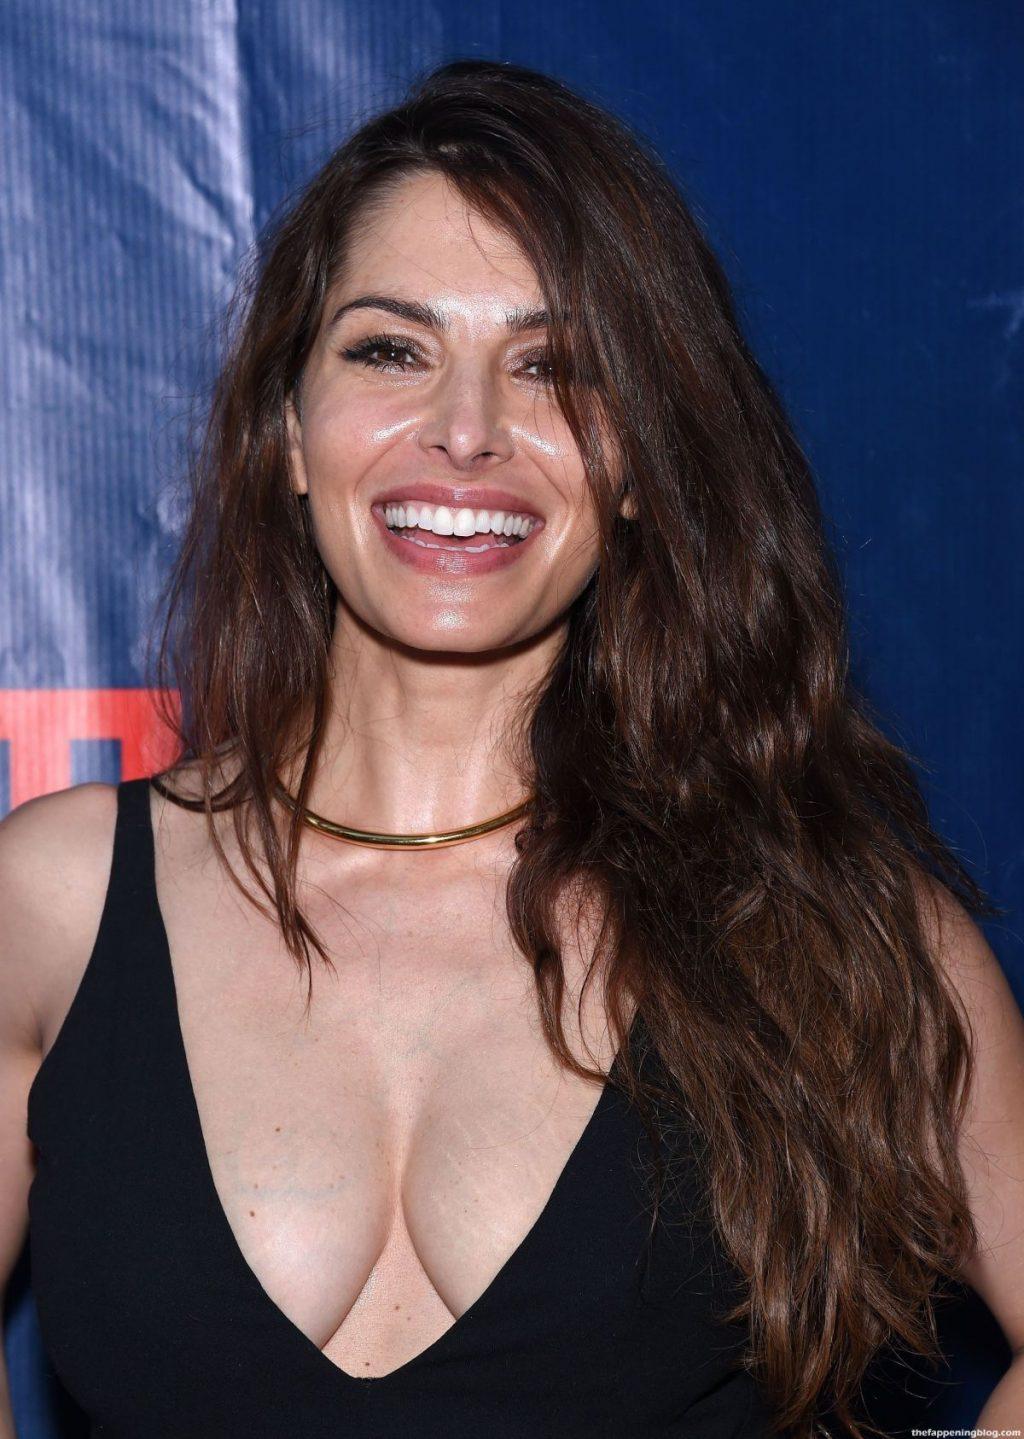 Sarah Shahi Nude & Sexy – Part 2 (78 Photos + Sex Video Scenes)